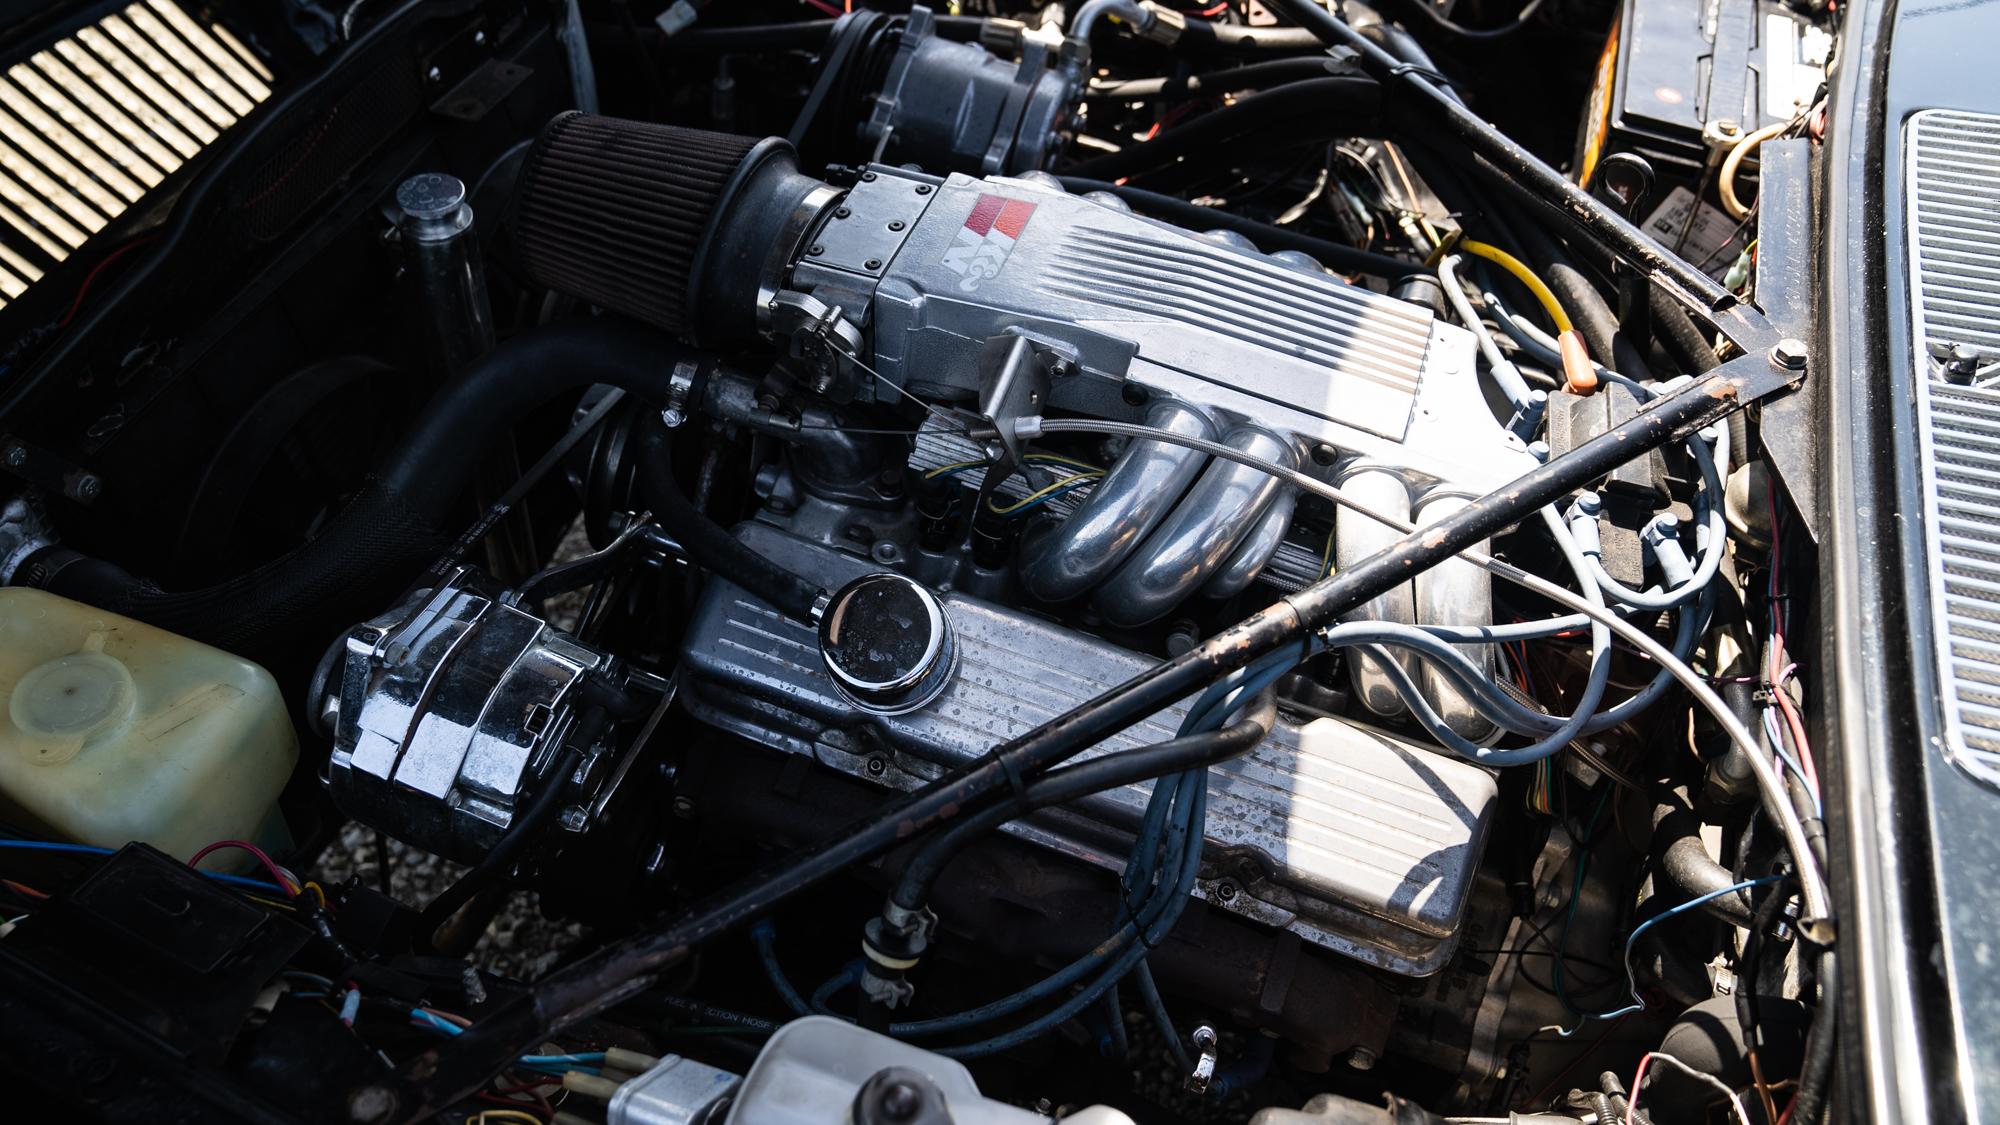 1986 Jaguar XJ6 engine v8 swap